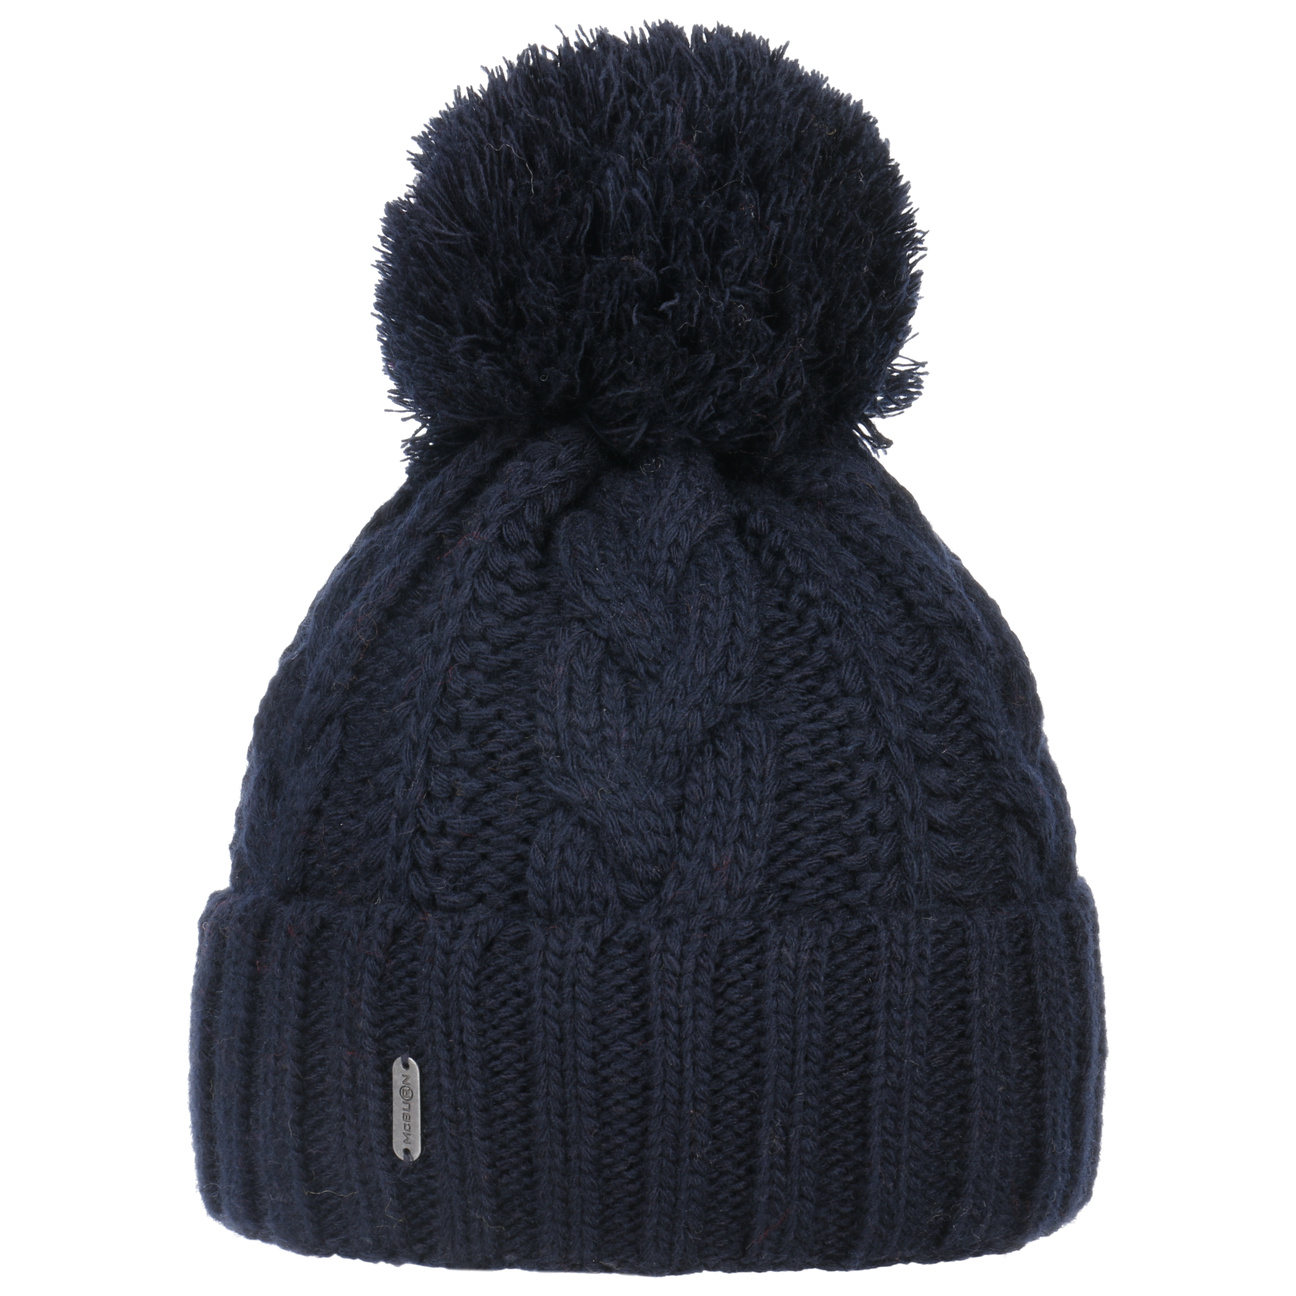 b02d27cd722 ... Giant Bobble Hat by McBURN - blue 1 ...